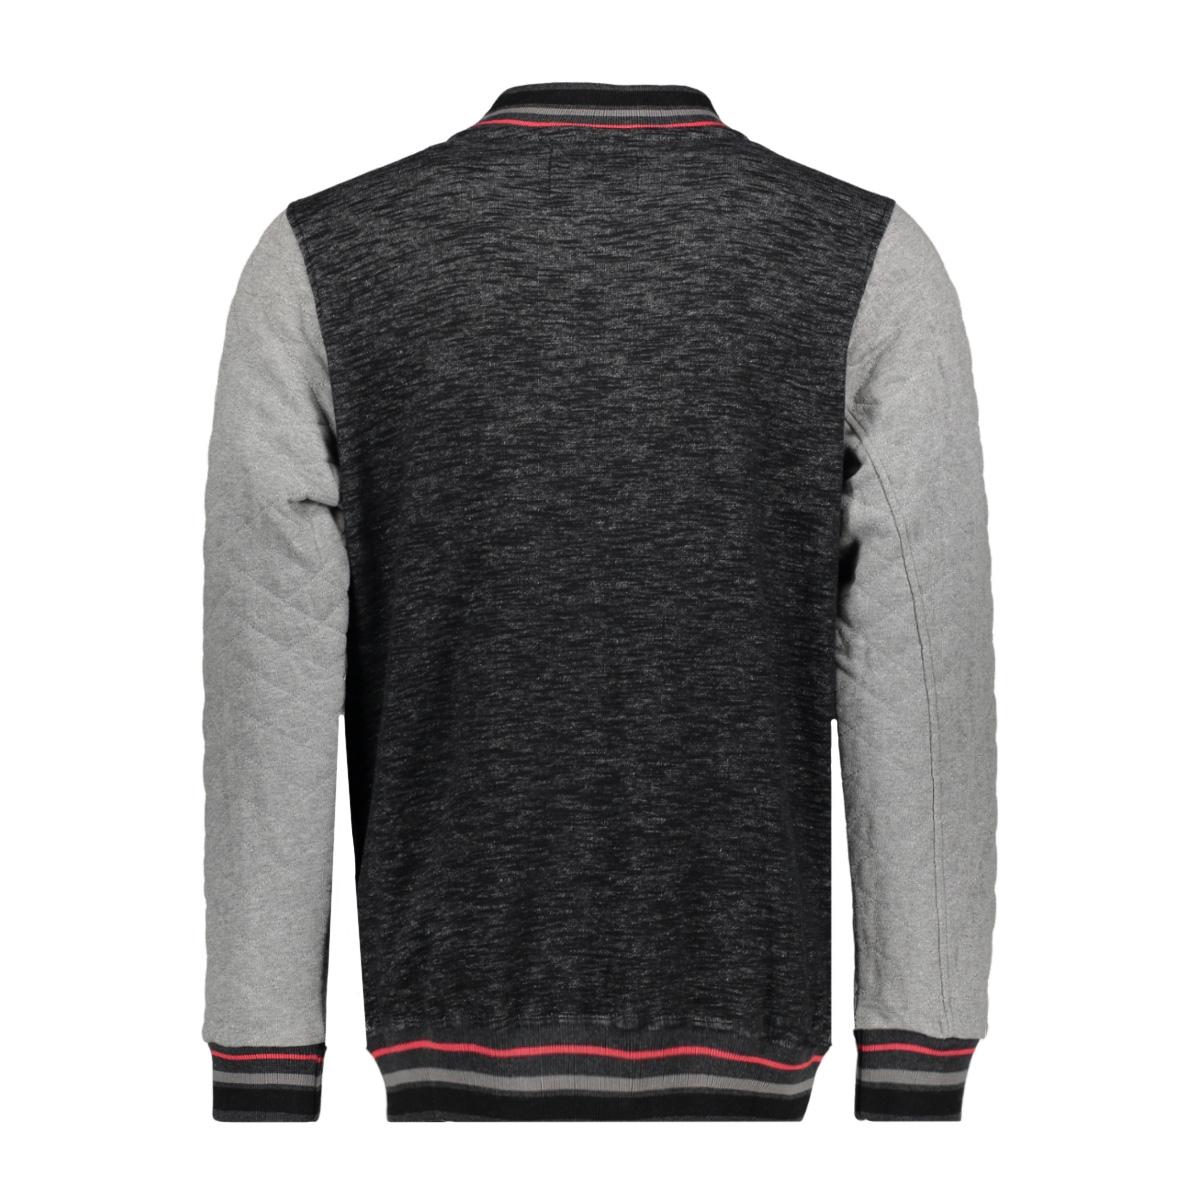 msw771432 twinlife vest antra melange